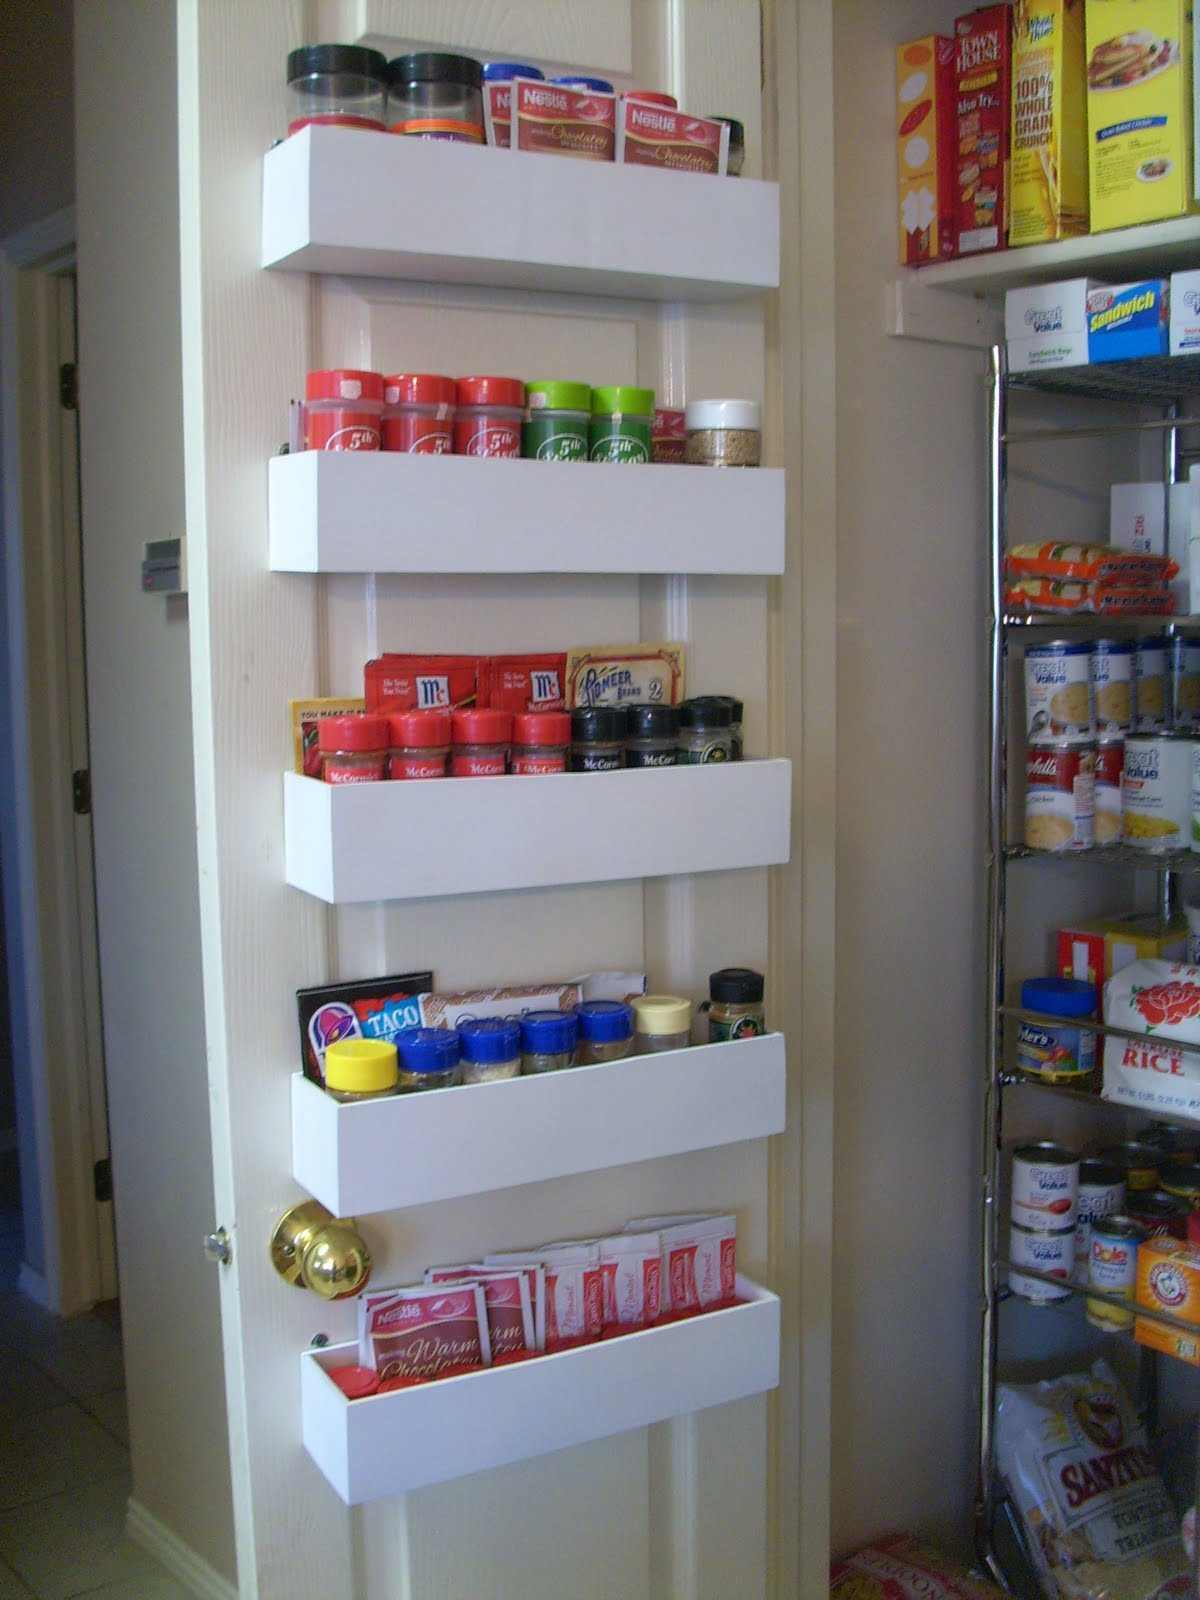 Best ideas about Spice Racks DIY . Save or Pin RobbyGurl s Creations DIY Pantry Door Spice Racks Now.